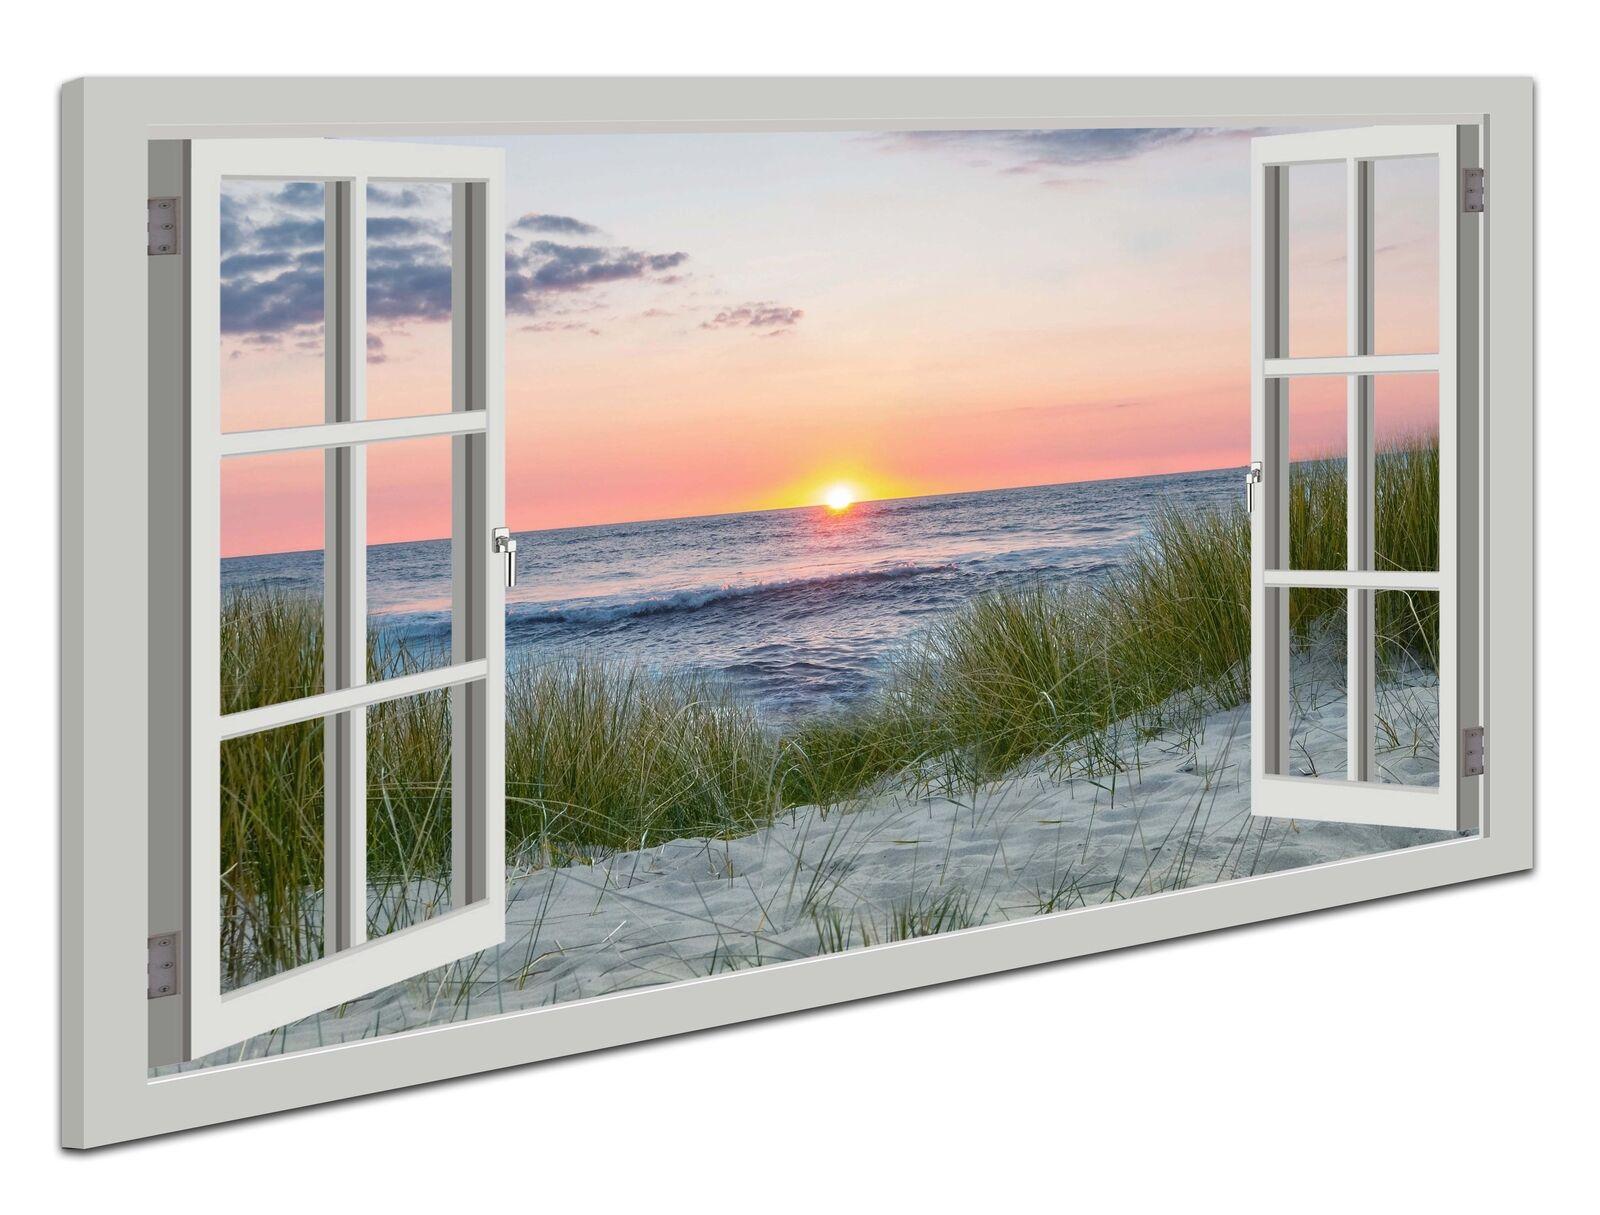 Leinwand Bild Wandbild Fensterblick Strand Meer Nordsee Sonnenuntergang Landscha